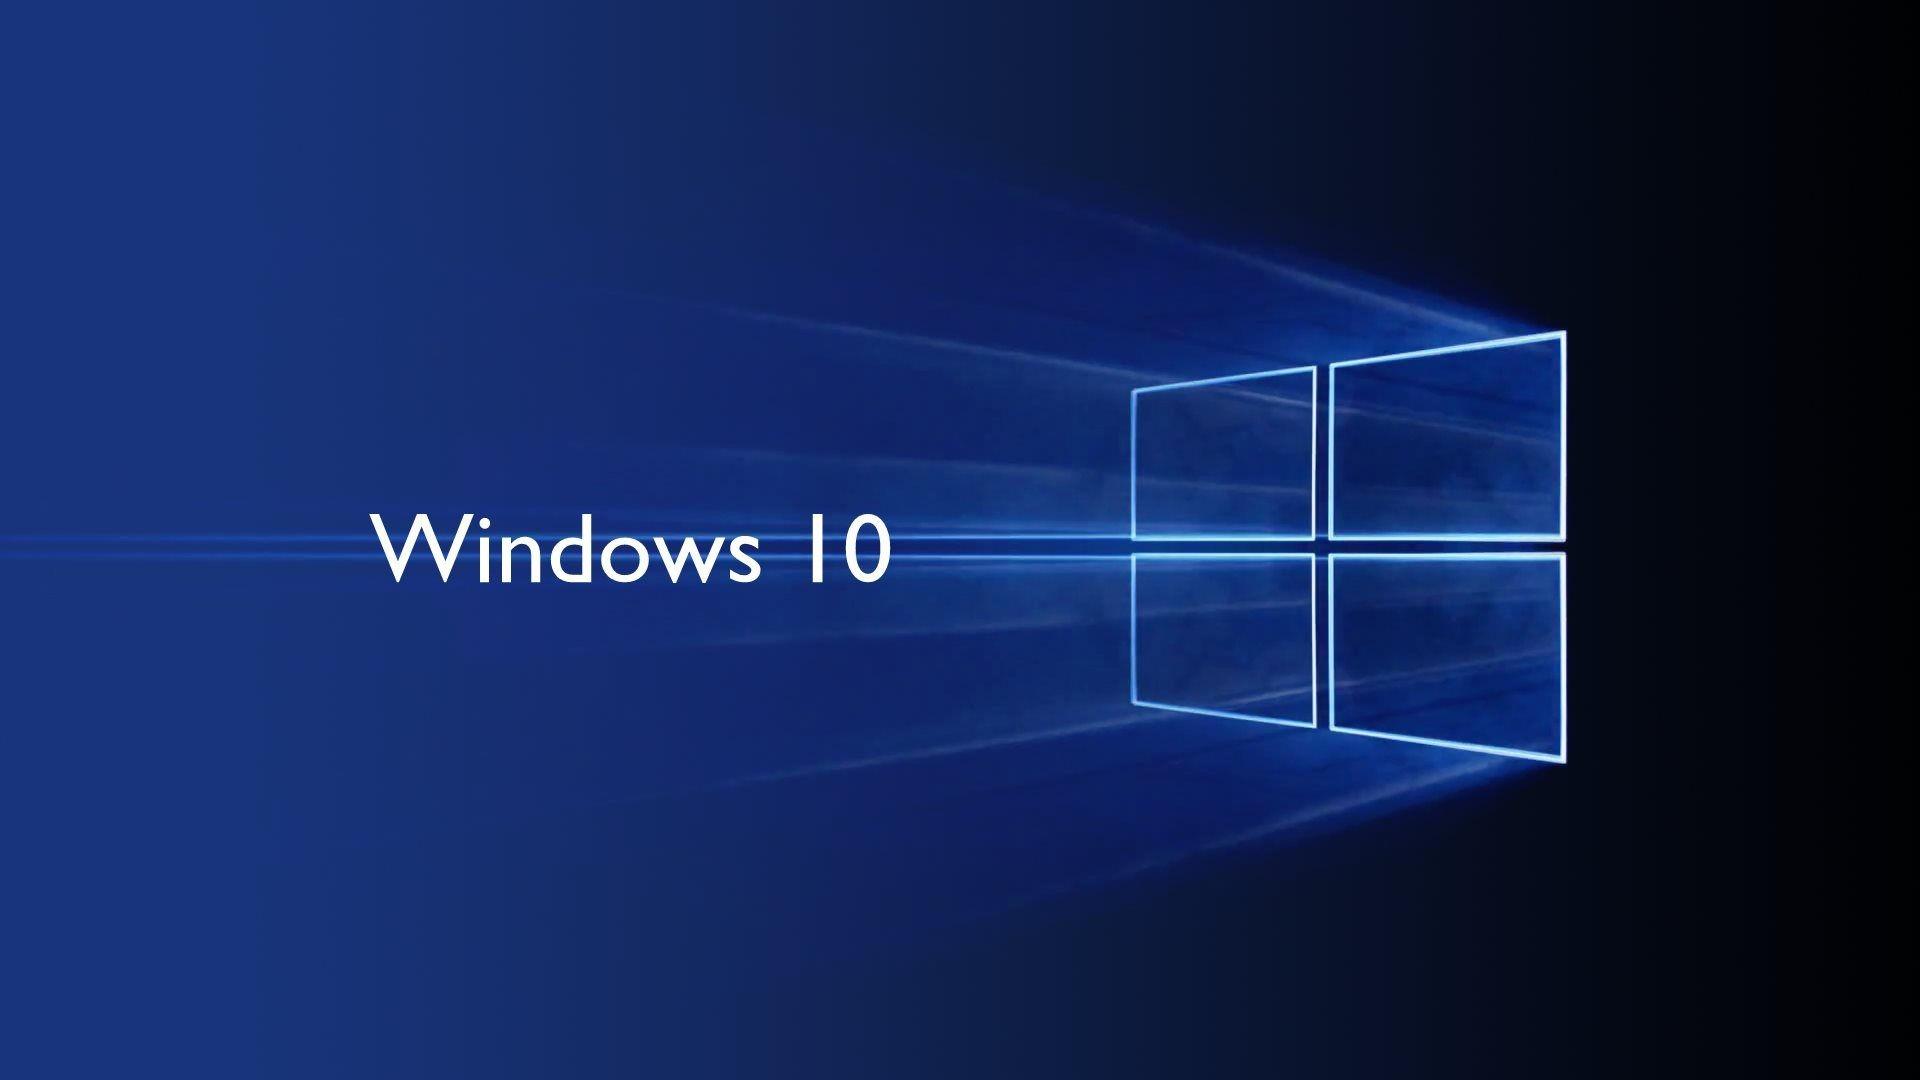 Windows 10 Beta Wallpaper 75 Images